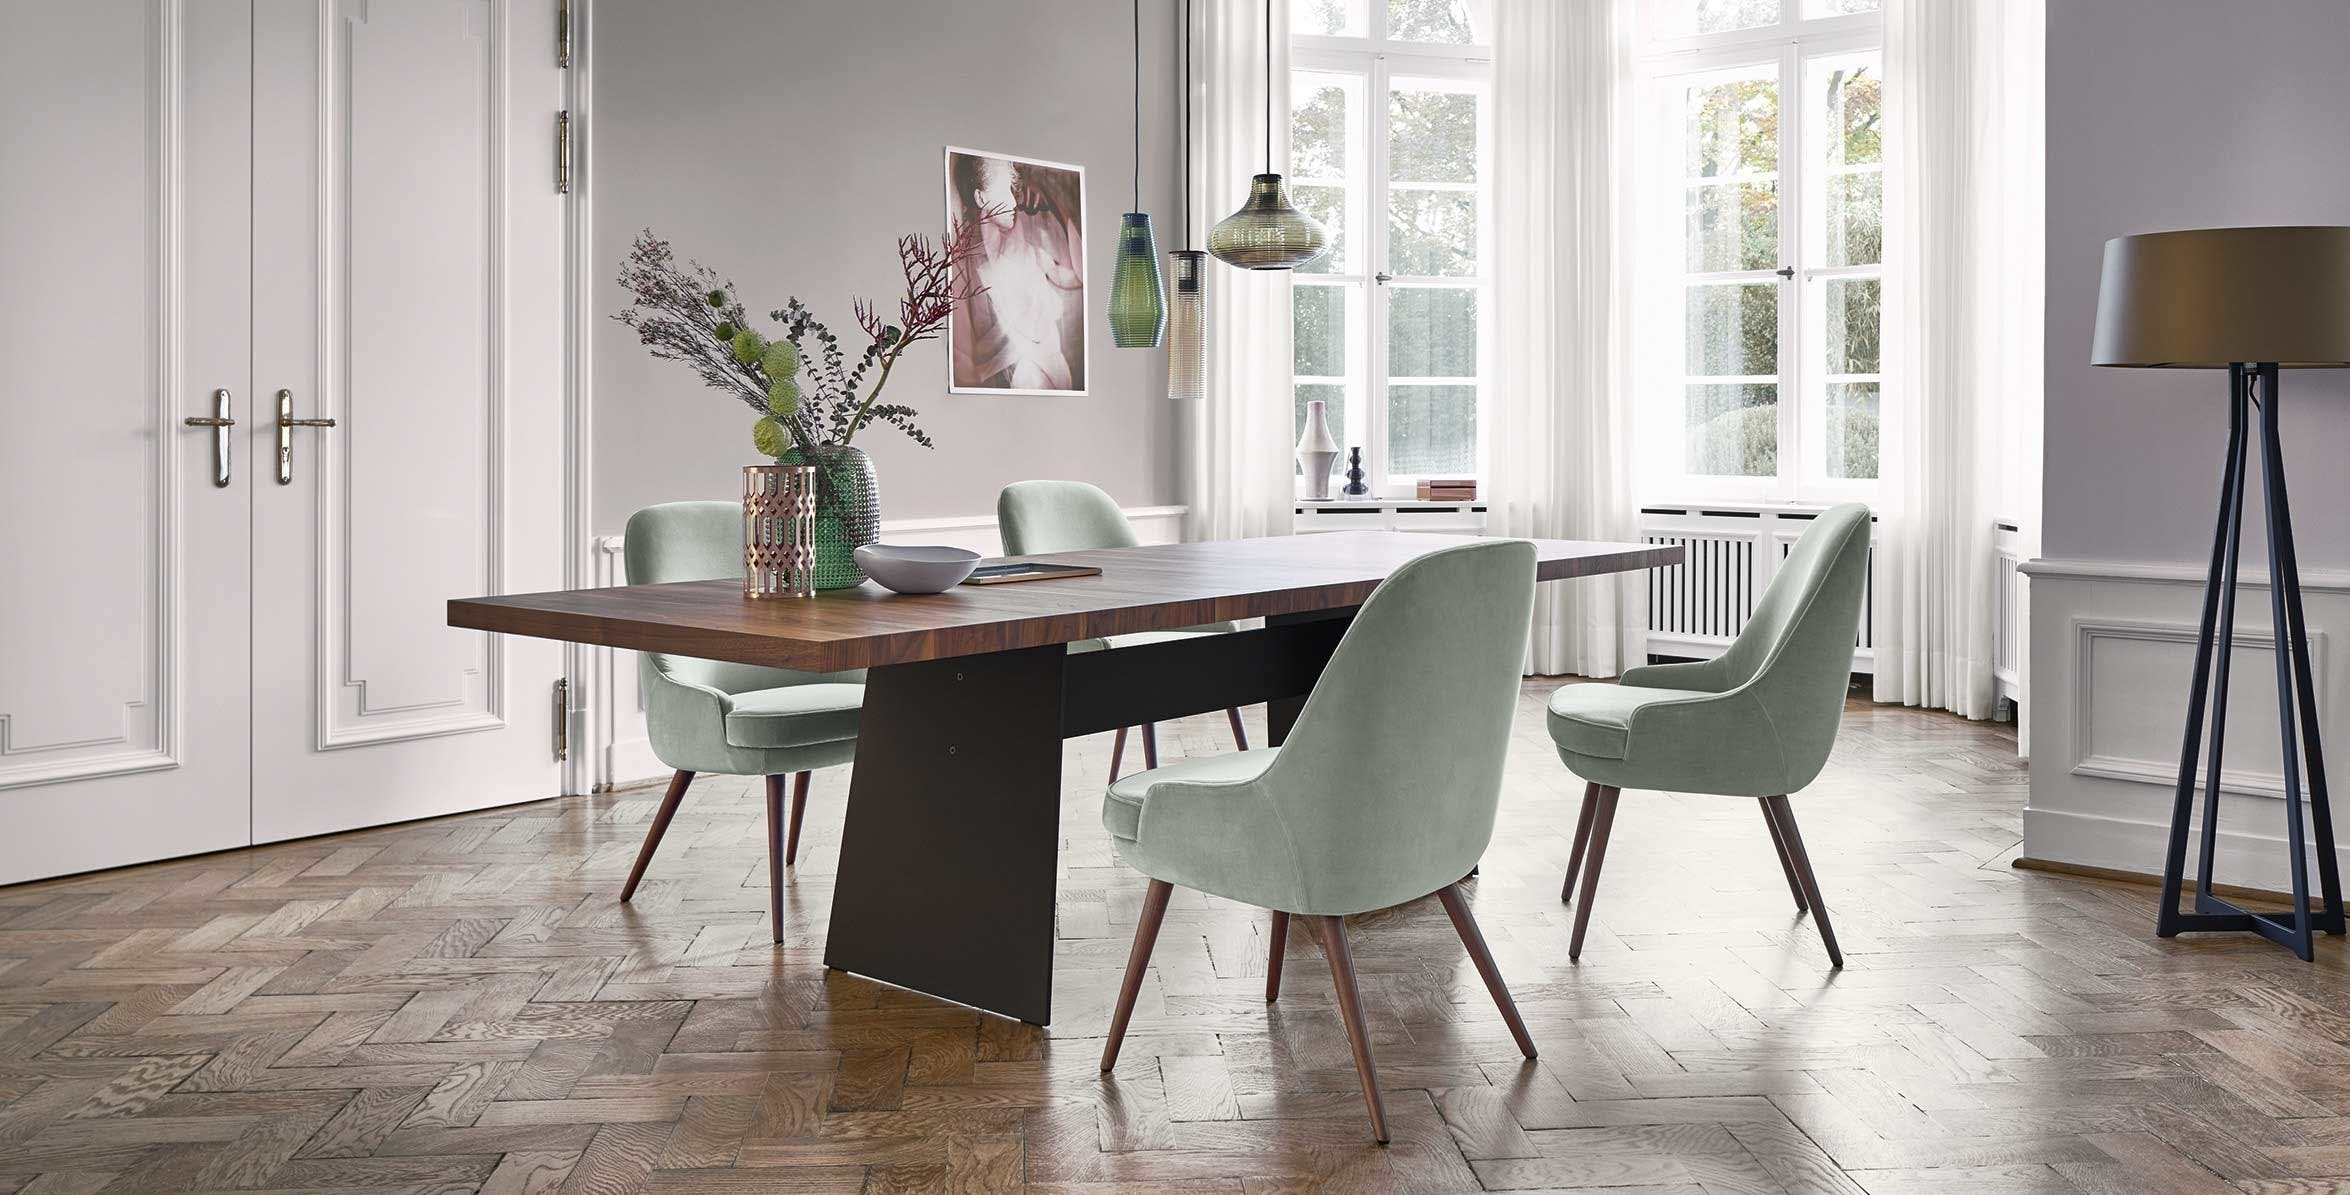 Buy Walter Knoll Furniture Online